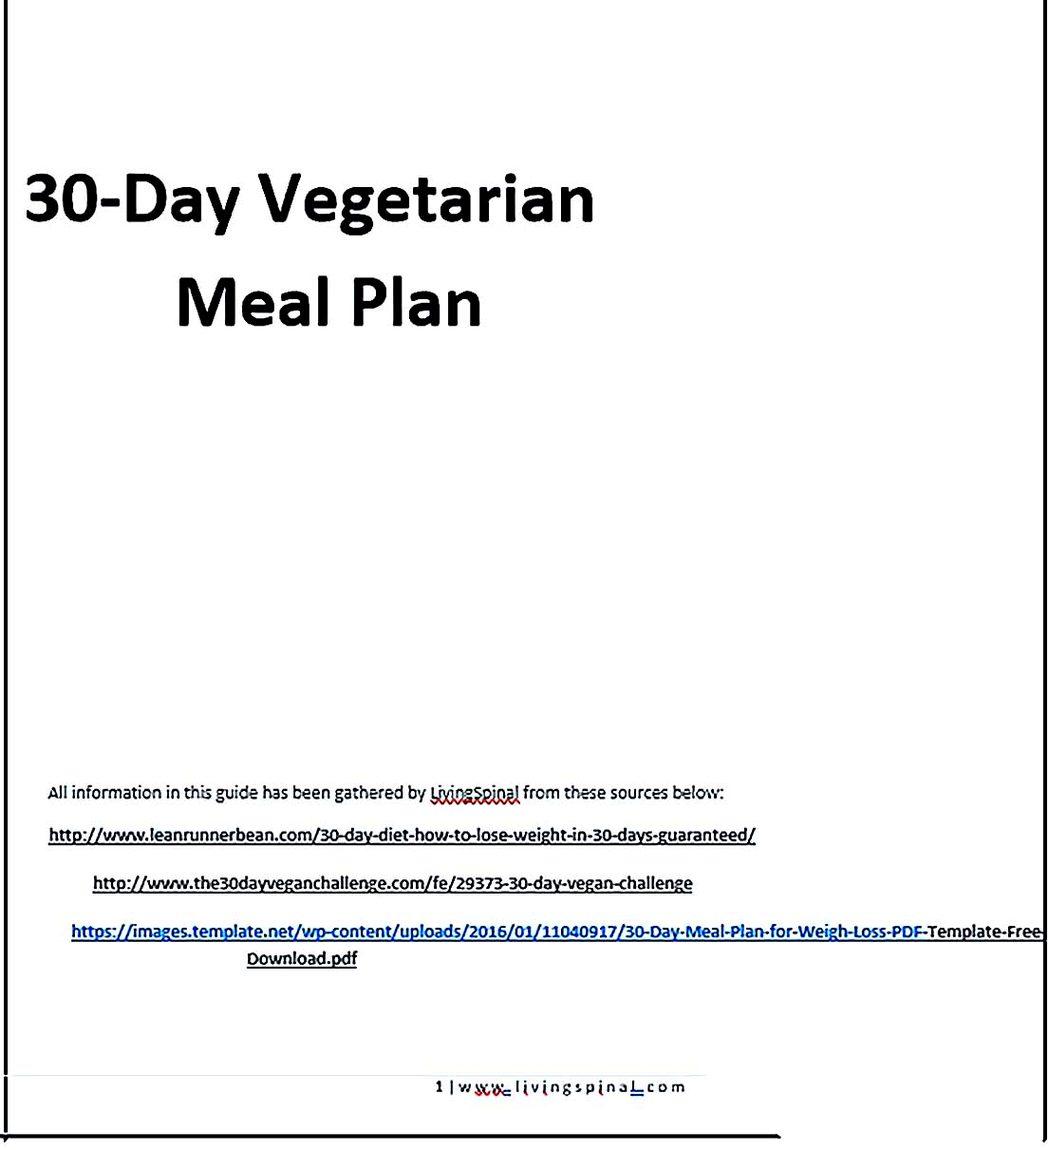 30 Day Vegetarian Meal Plan Guide